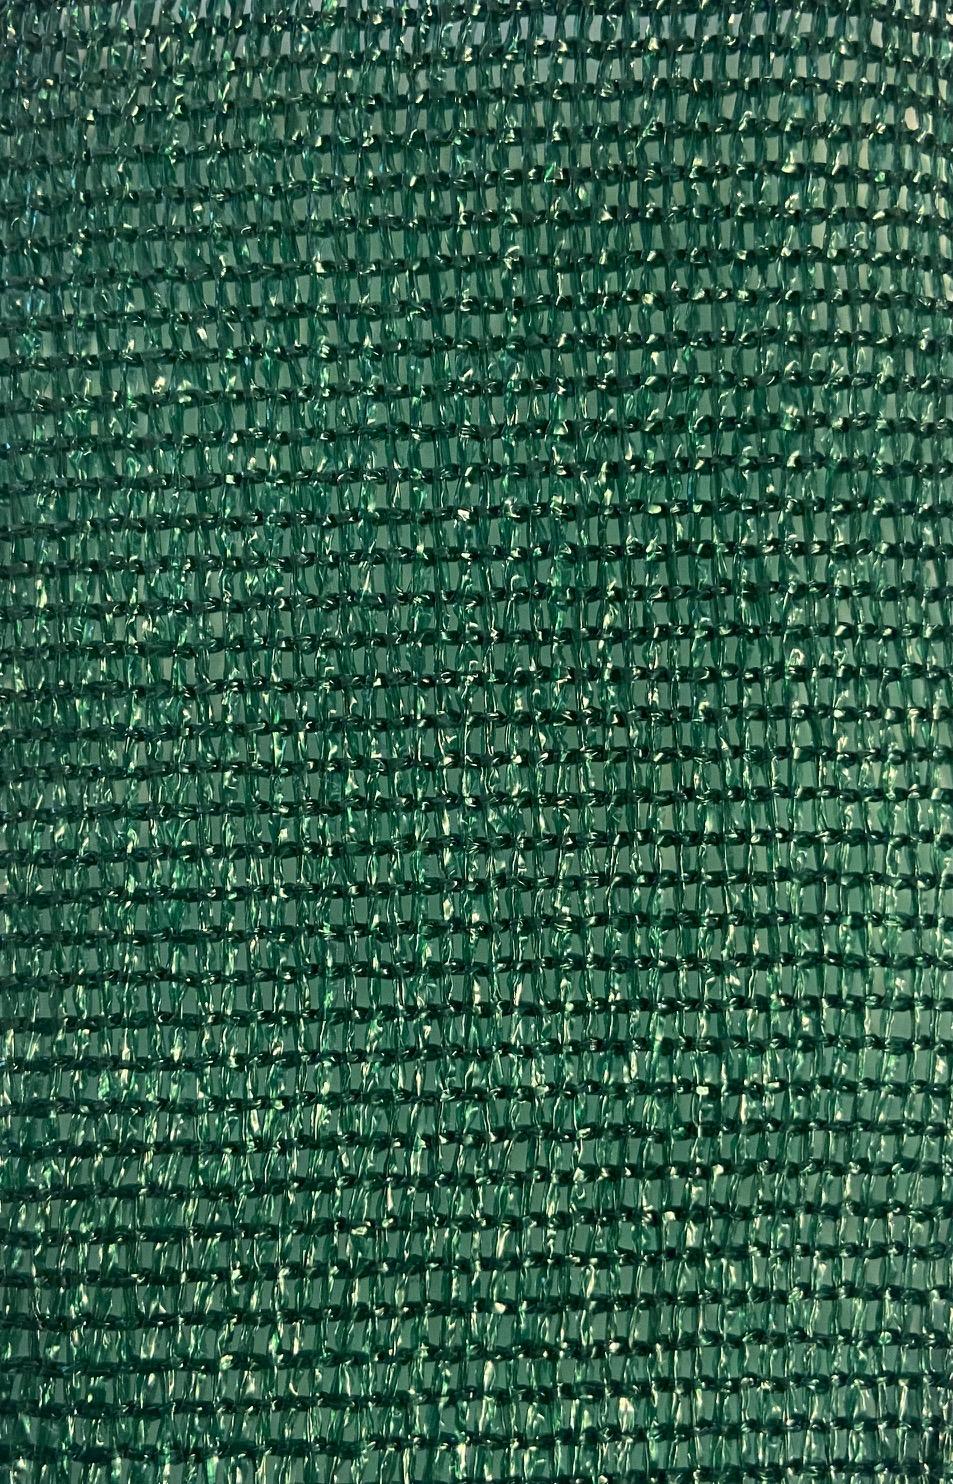 Shading mesh HDPE, width 300cm, weight 140g/m². Price per roll 150m², VAT incl.